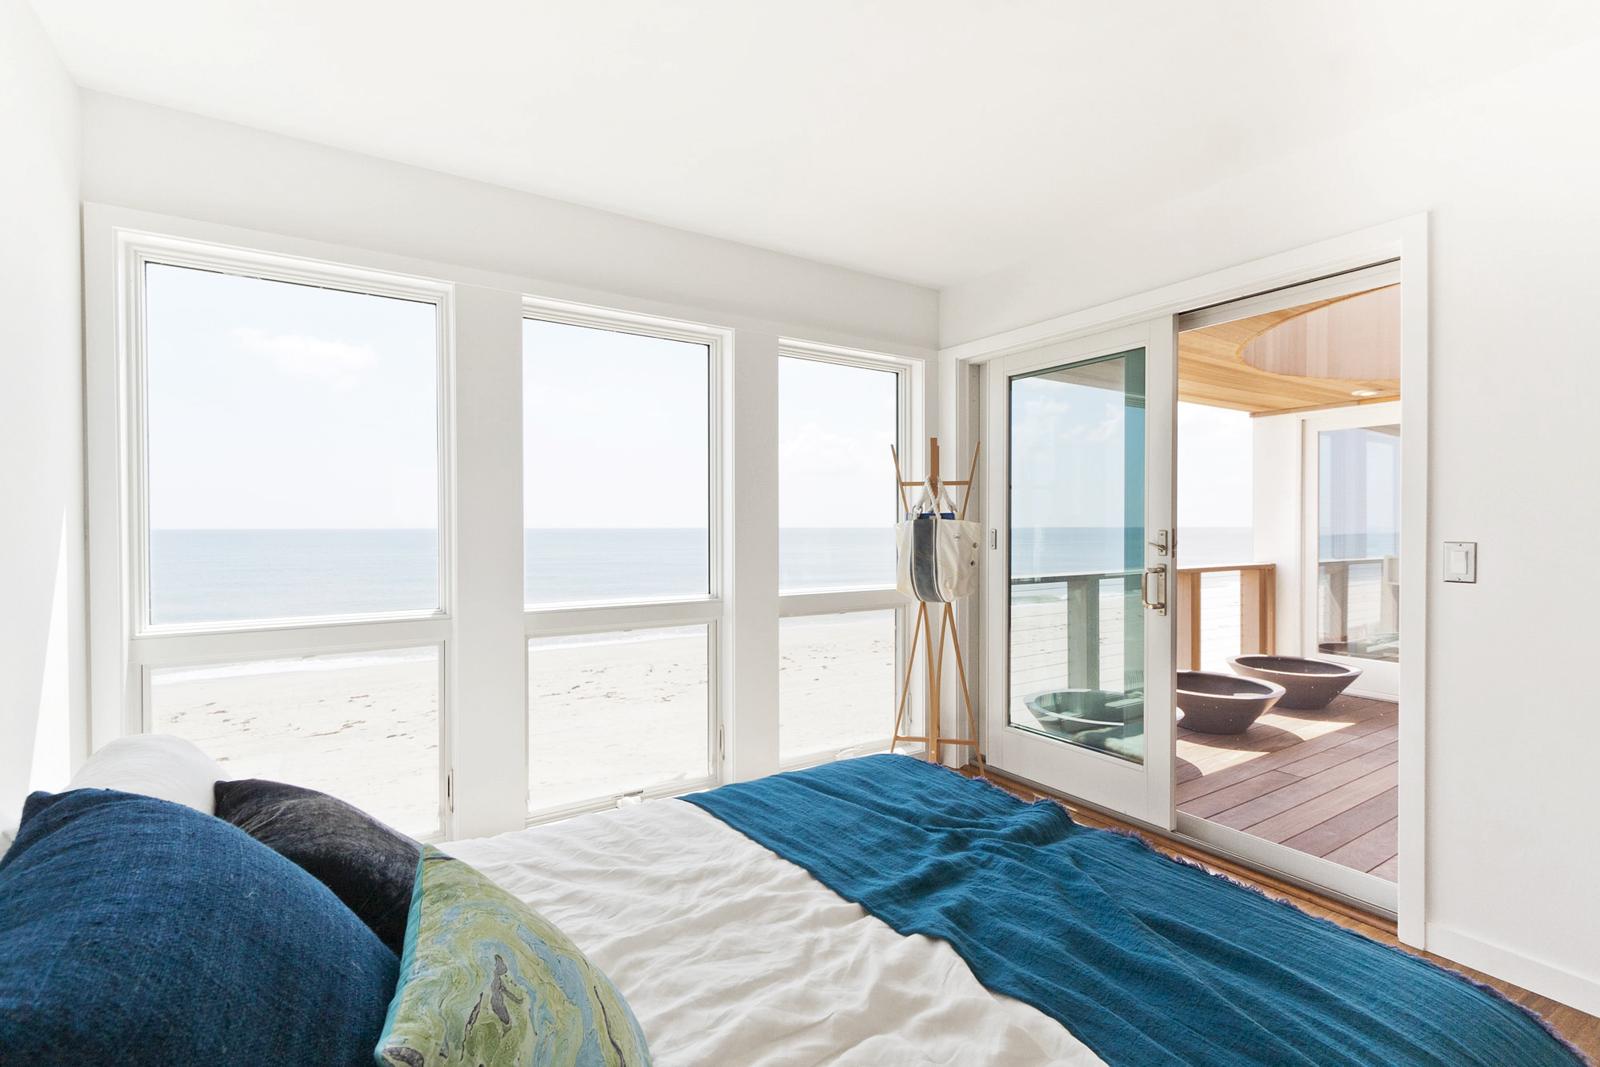 12-res4-resolution-4-architecture-modern-modular-home-prefab-dune-road-beach-house-interior-bedroom.jpg